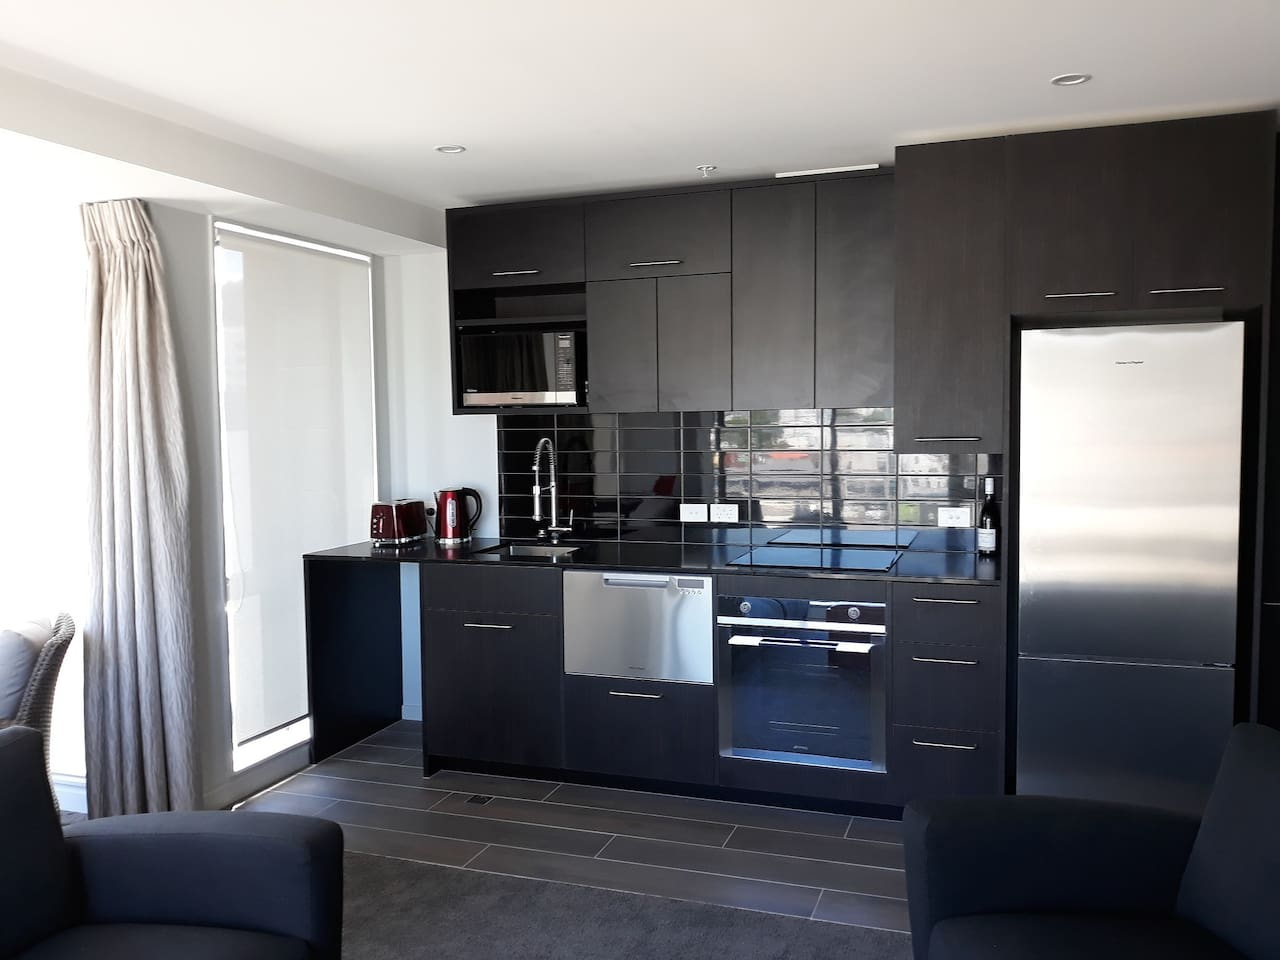 Full kitchen including single dish drawer dishwasher